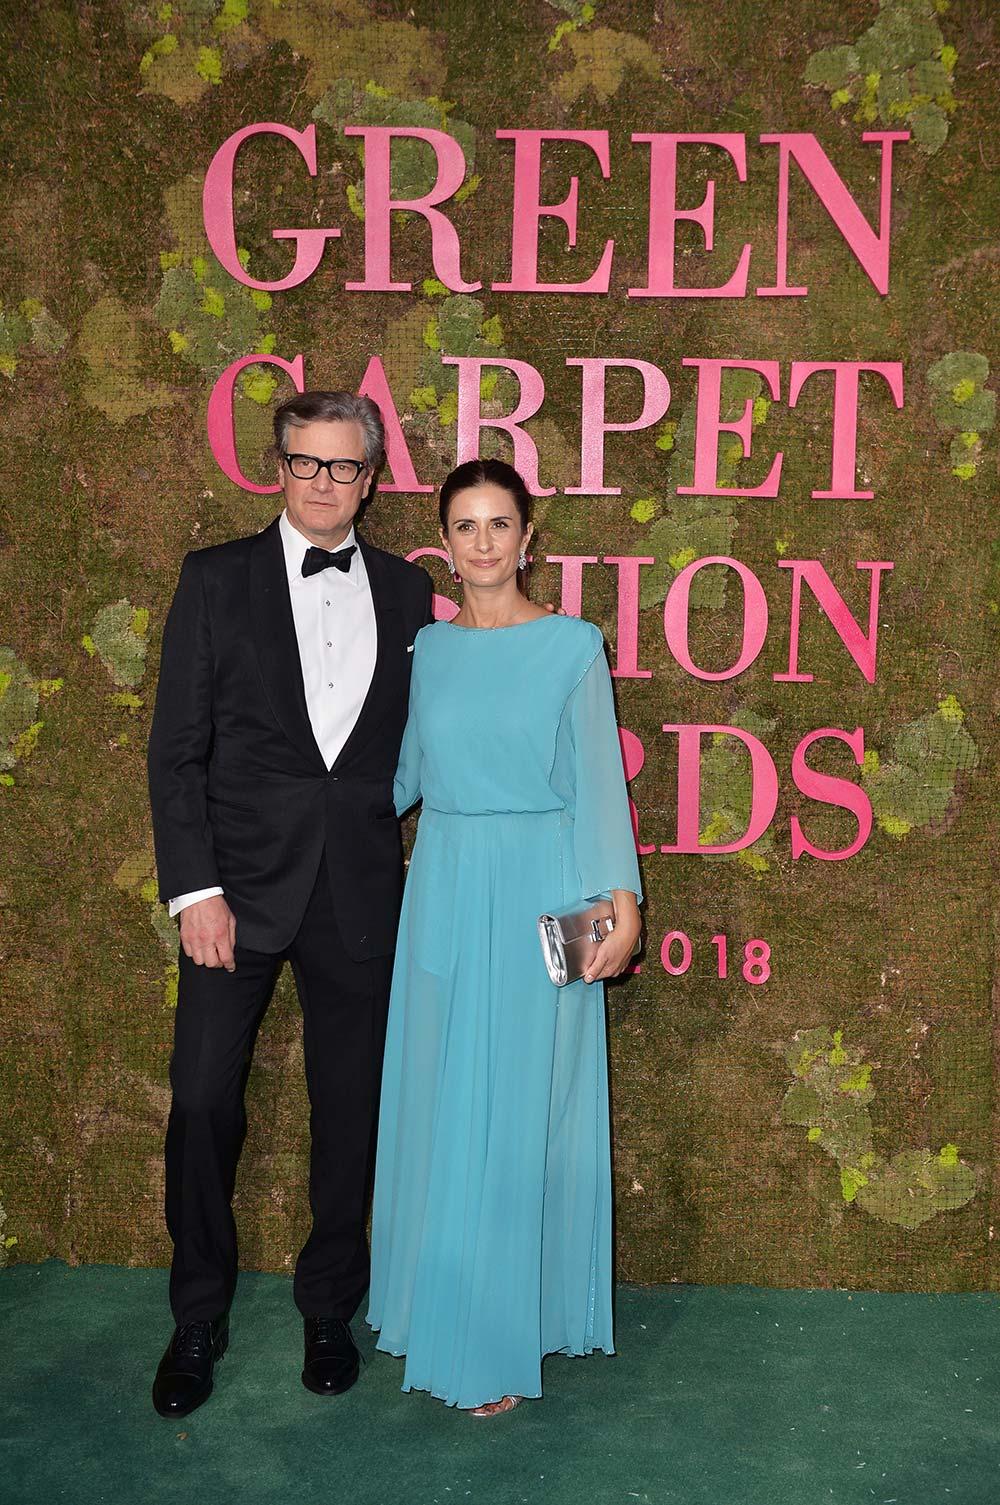 Green Carpet Fashion Awards 2018 - Livia and Colin Firth - Hair Massimo Serini - Makeup Emanuela Di Giammarco